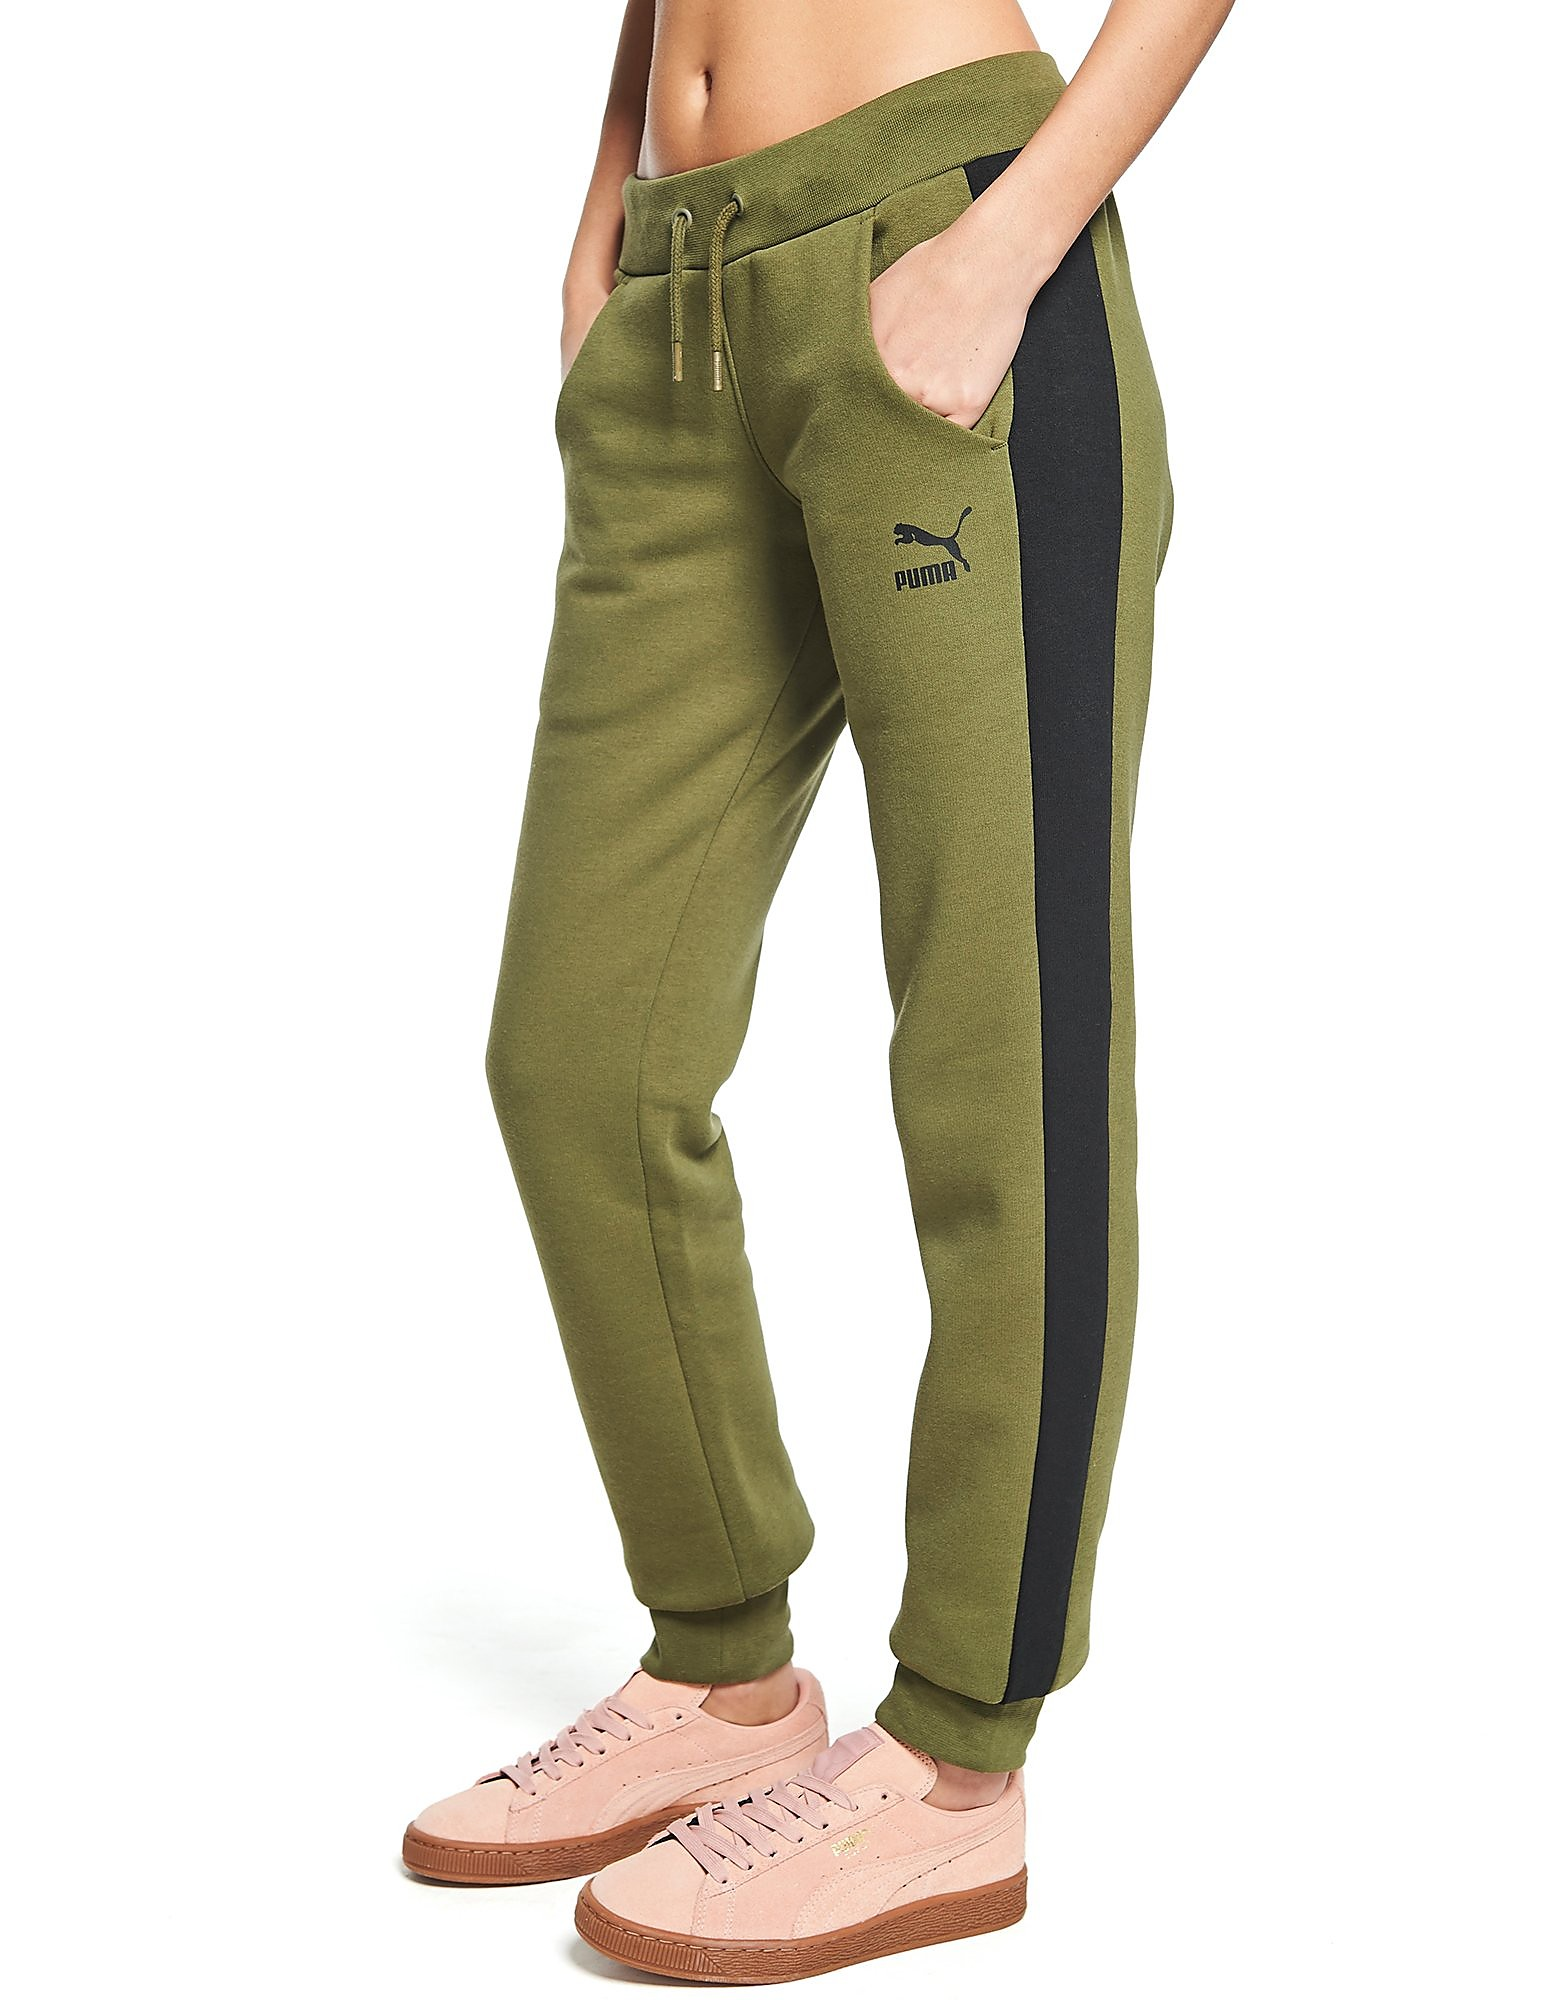 PUMA Panel Fleece Pants